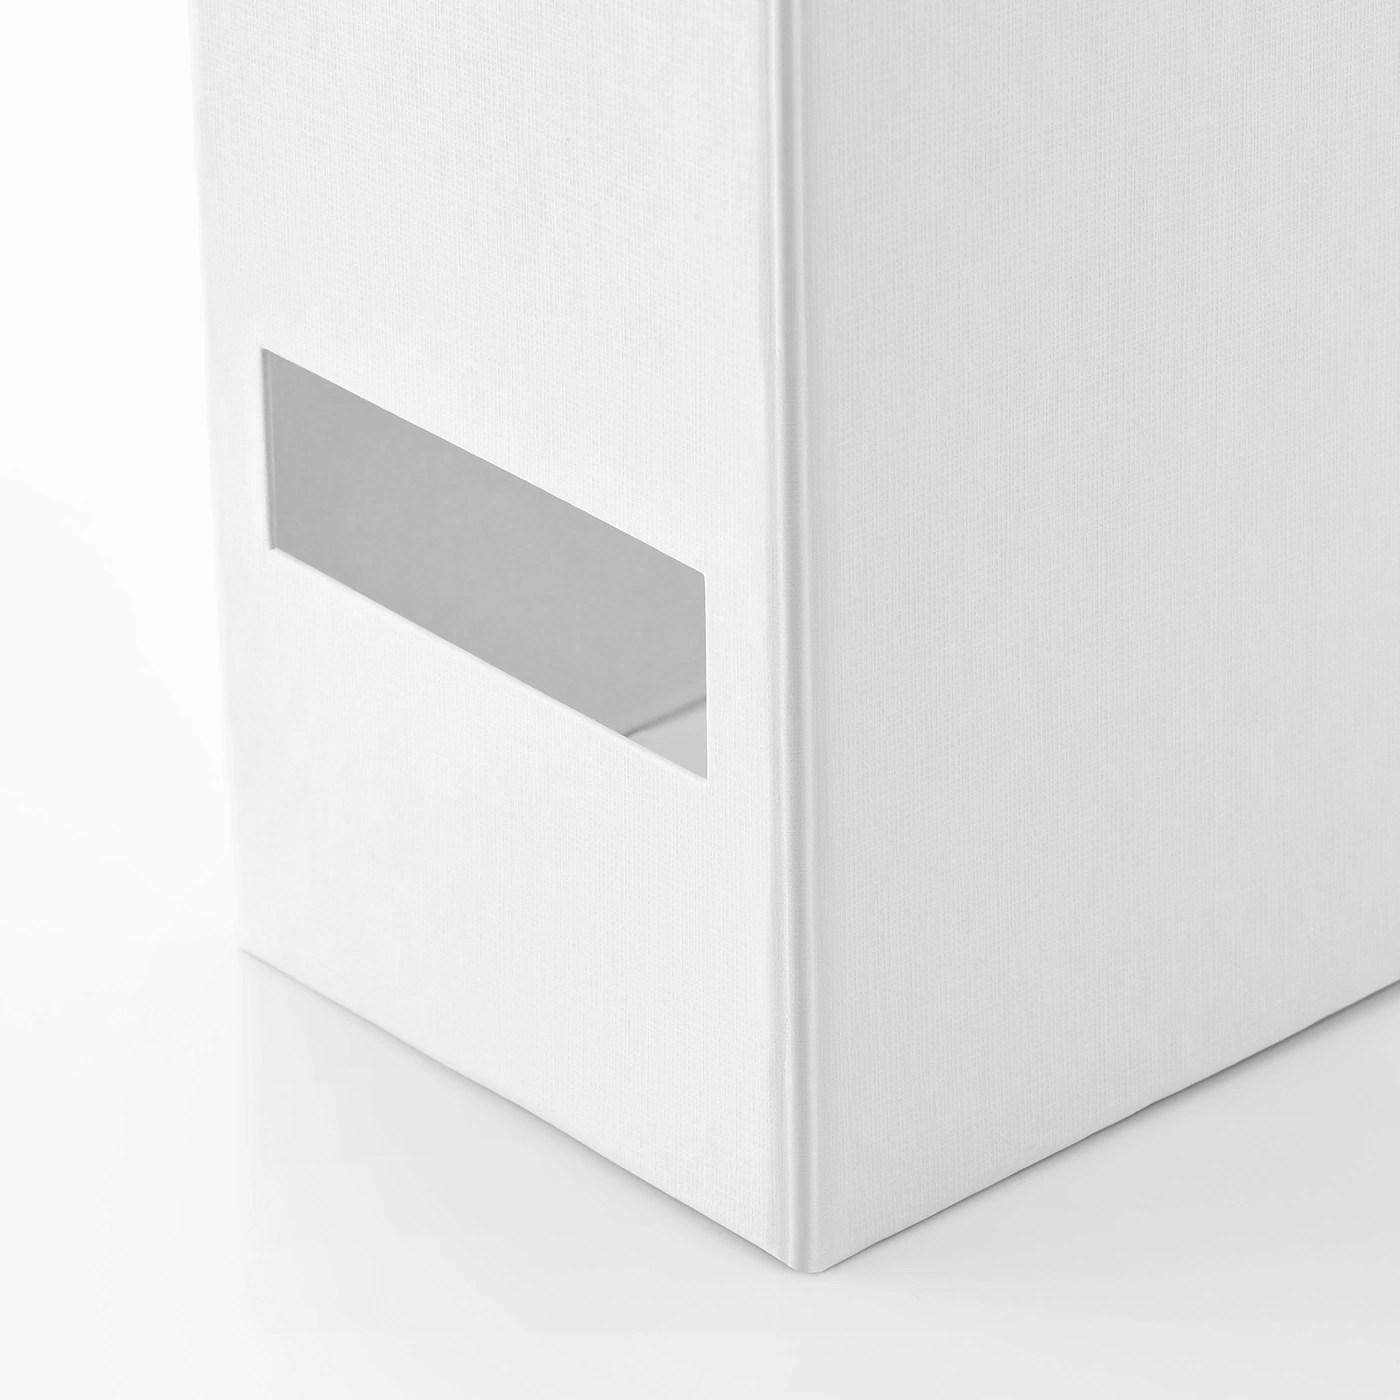 Tjena Range Revues Blanc Materiau Durable Ikea